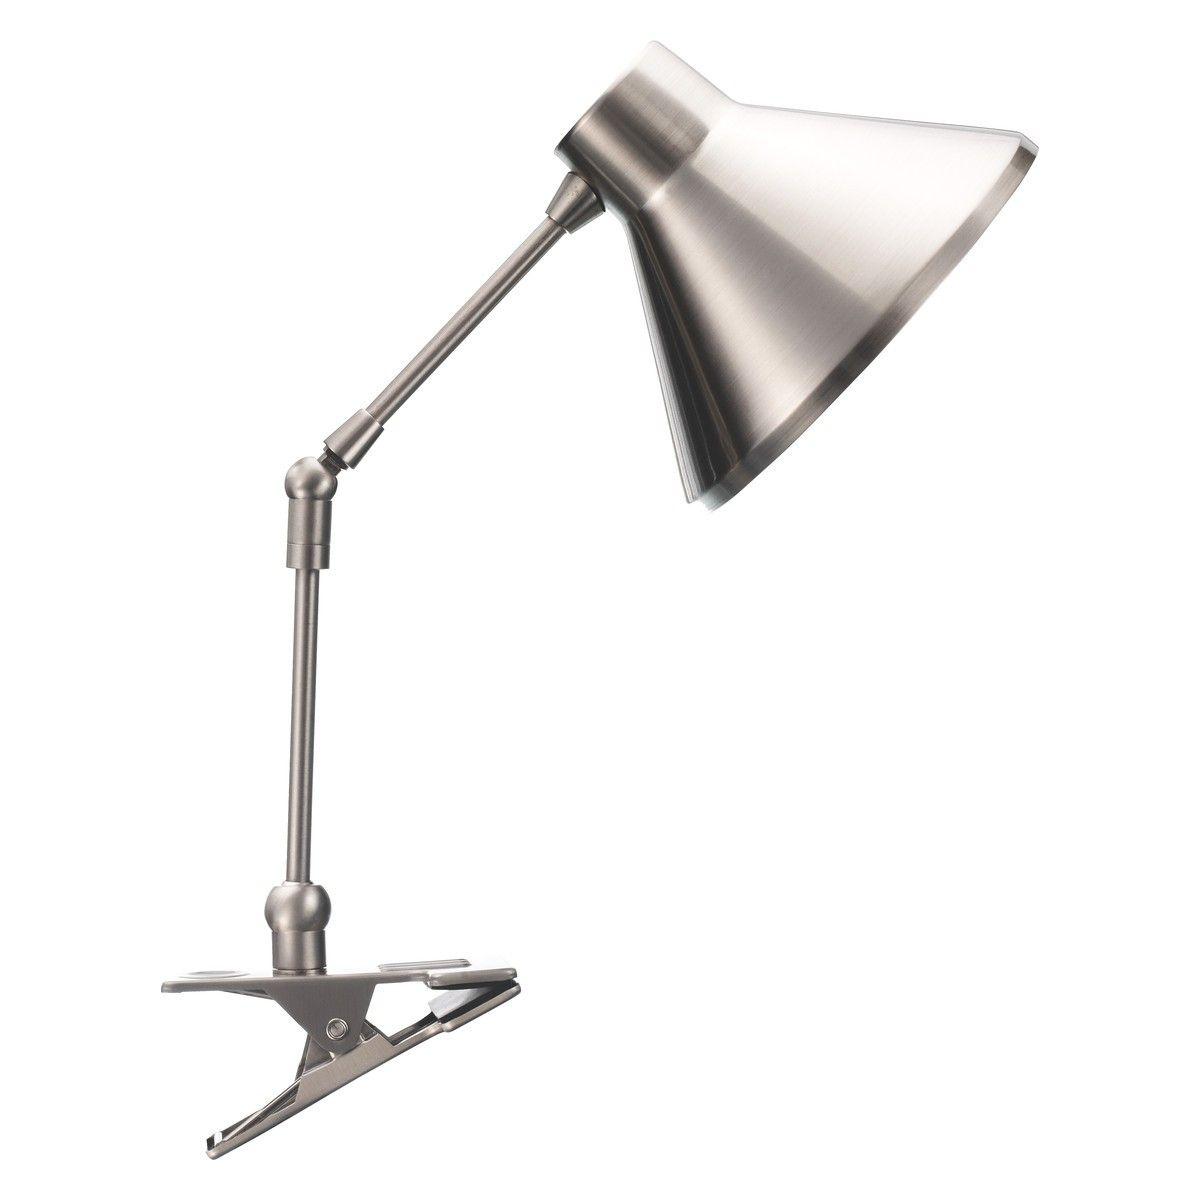 Desk Lamps - Our Pick of the Best | Brushed metal, Desk lamp and Desks